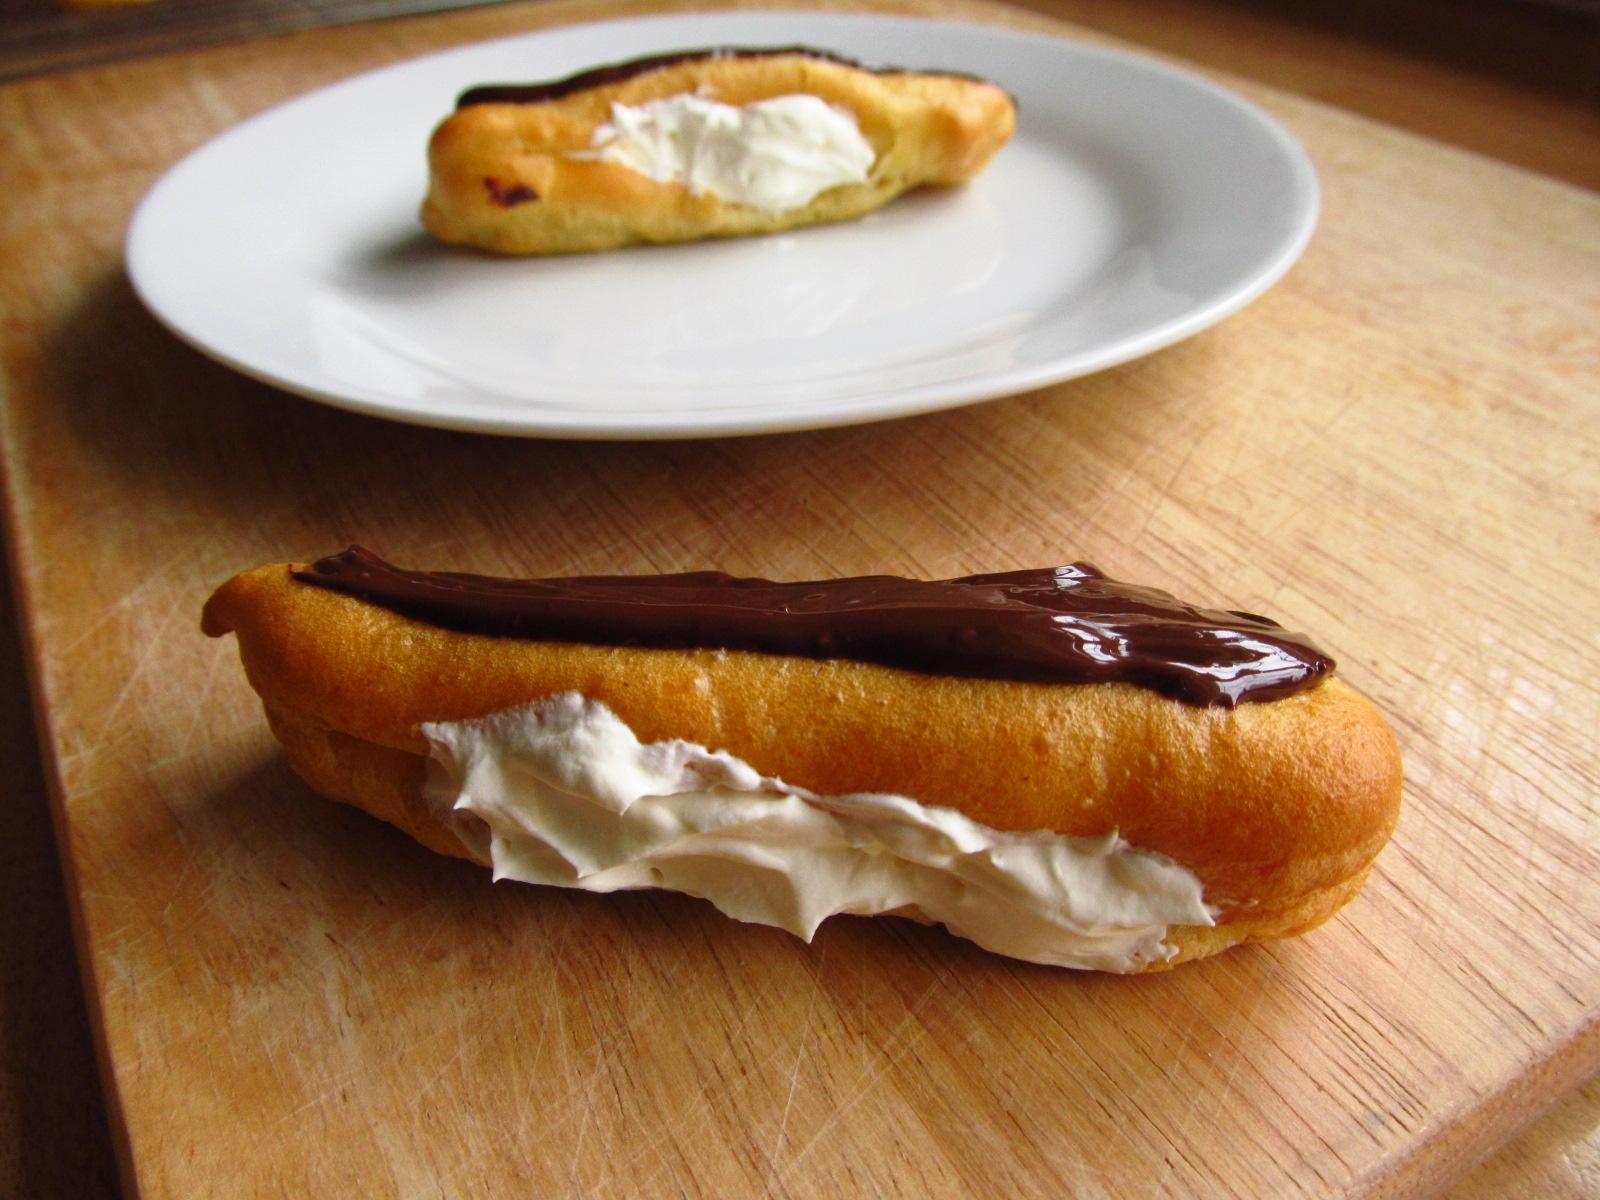 Good Food, Shared: Mini Chocolate Eclairs